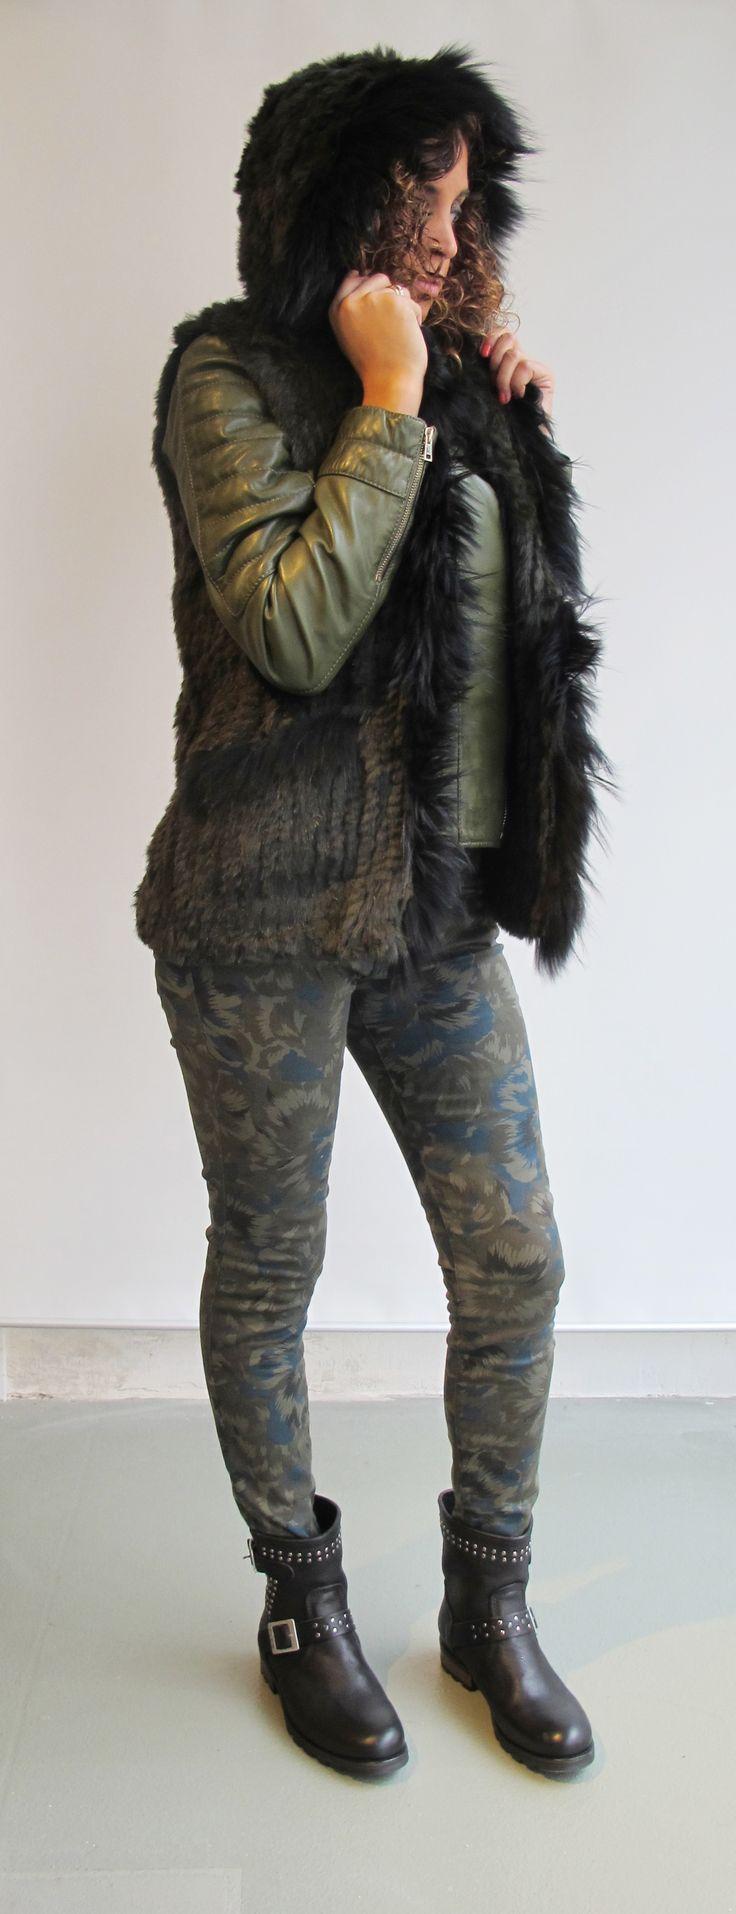 #wilcolook #moda #mujer chaleco piel #oakwood cazadora piel #oakwood pantalon #reiko botas #palladium http://www.miinto.es/shops/b-1040-wilco